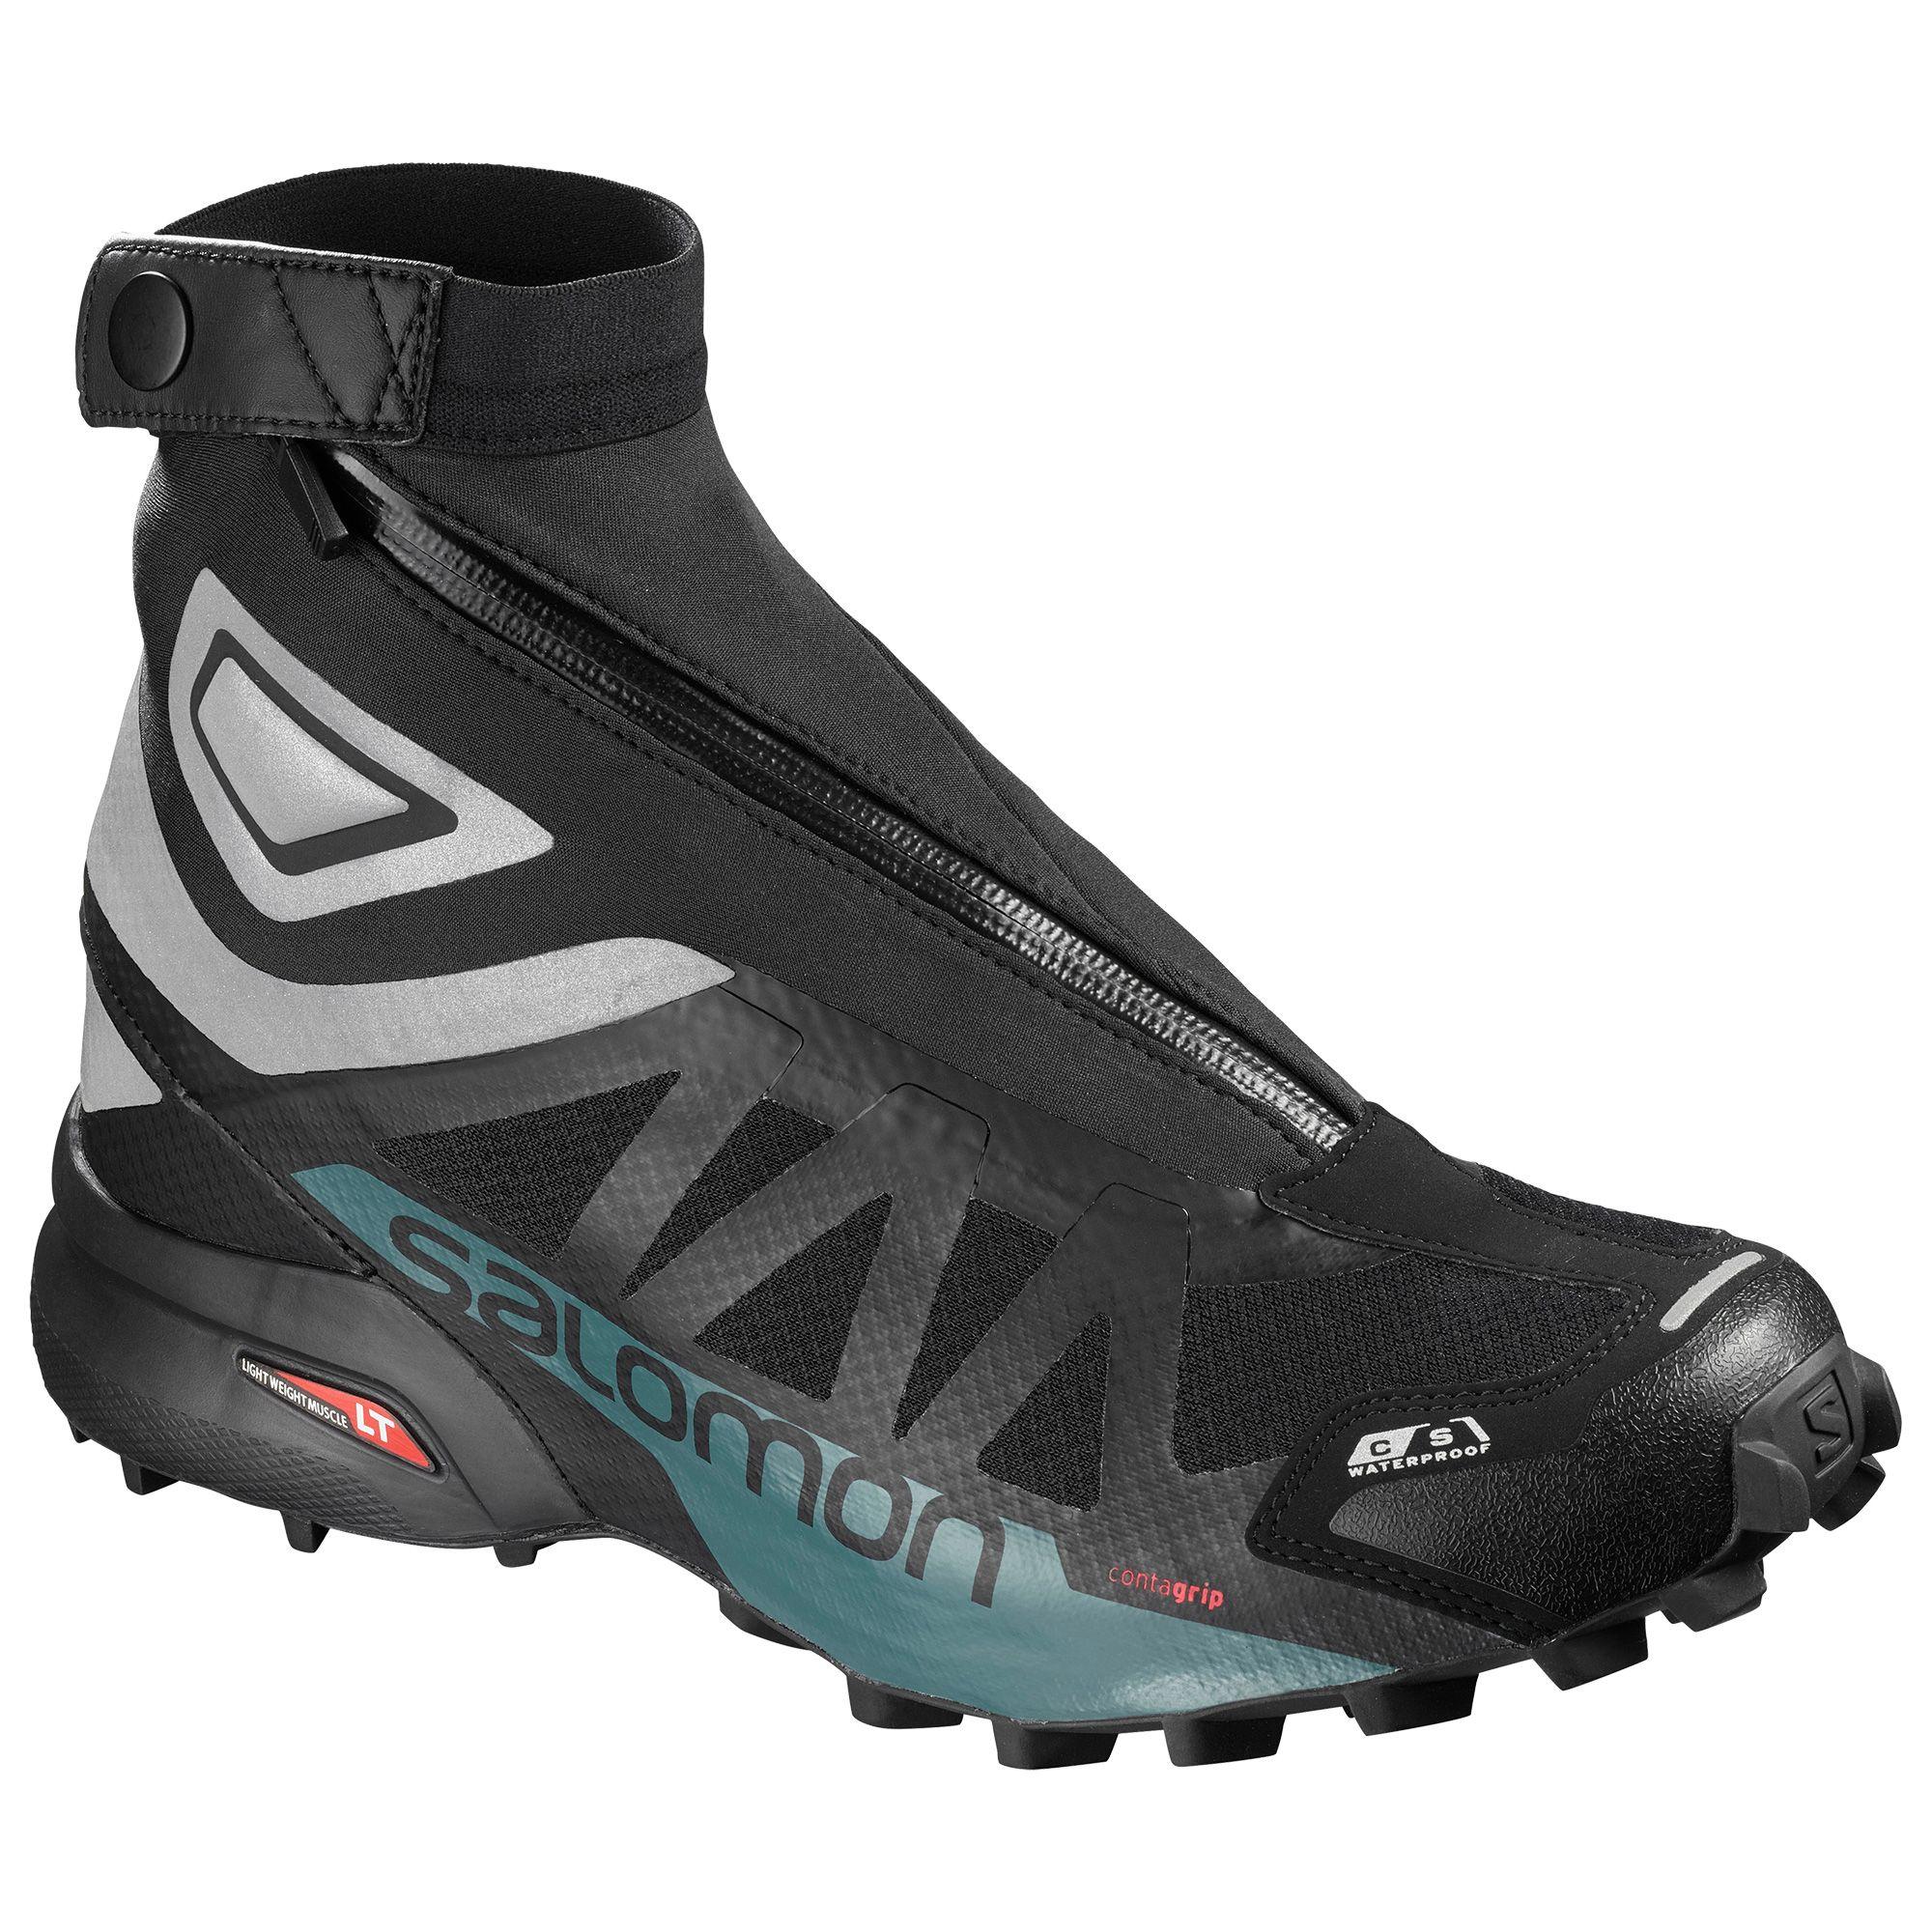 reputable site 08d6b 33283 SNOWCROSS 2 CSWP Trail Running Shoes, Hiking Shoes, Running Shoes For Men,  Shoes